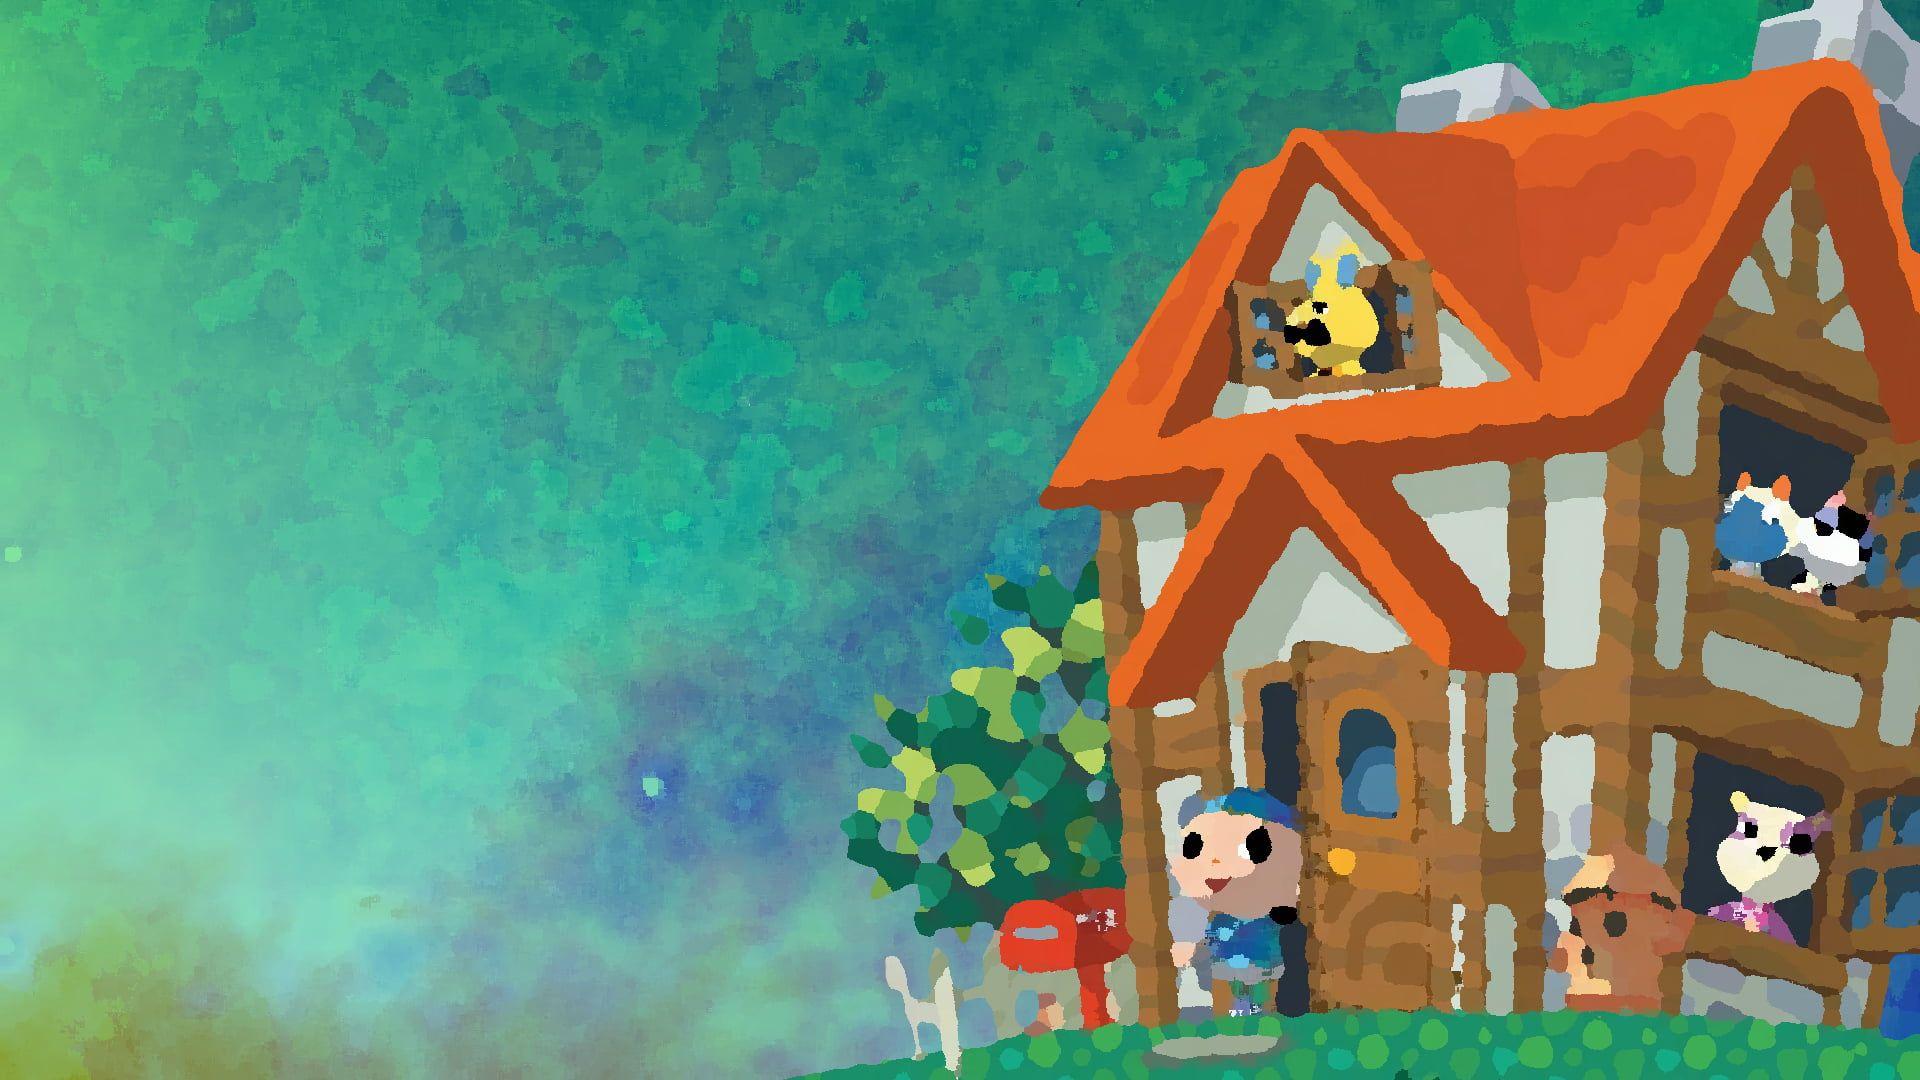 Animal Crossing Games Art House Male 1080p Wallpaper Hdwallpaper Desktop Animal Crossing Game Art Wallpaper